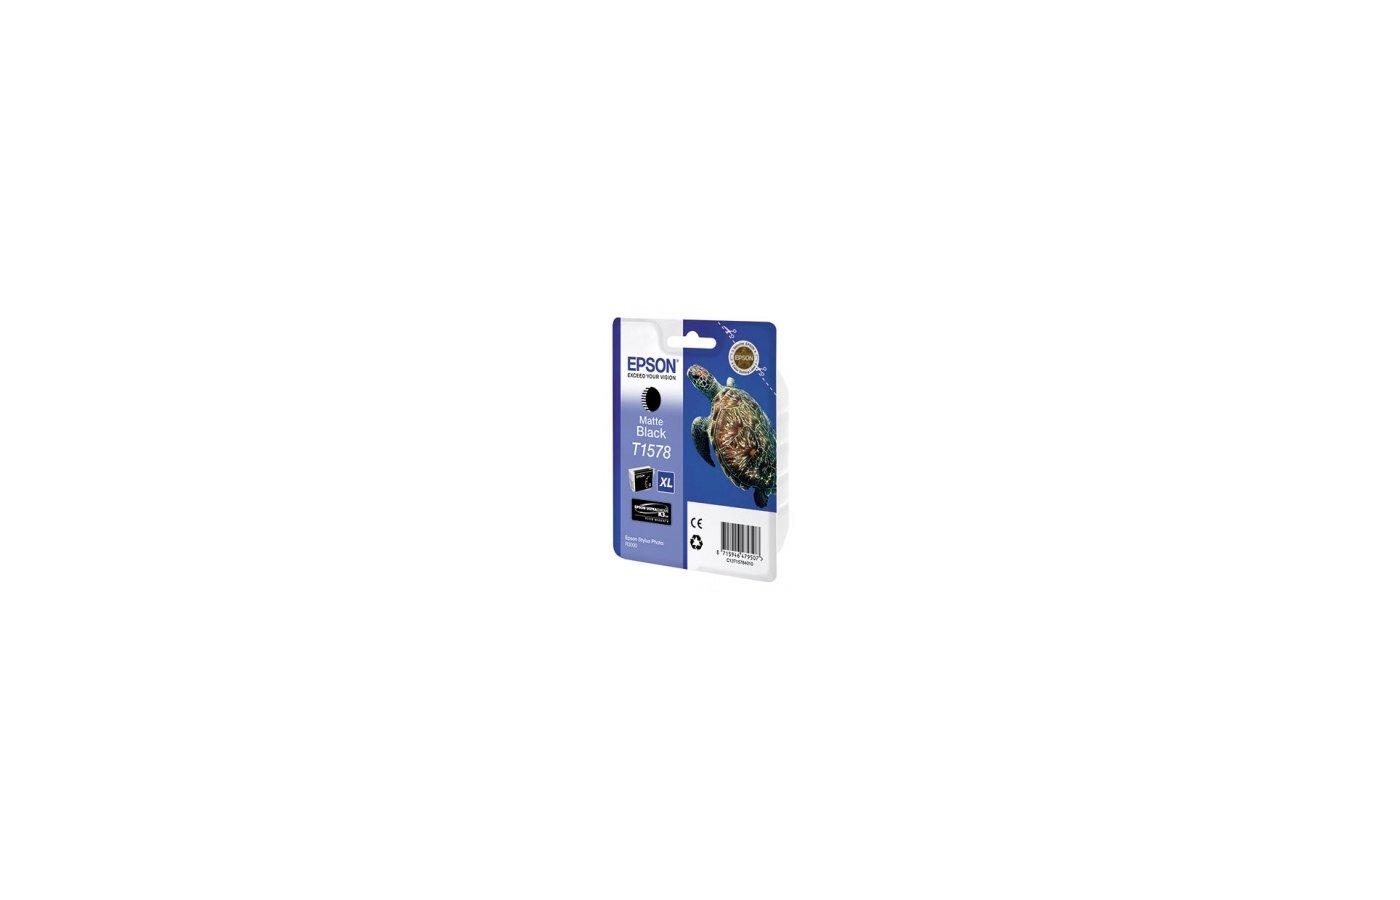 Картридж струйный Epson C13T15784010 matte black для Stylus Photo R3000 (850стр)